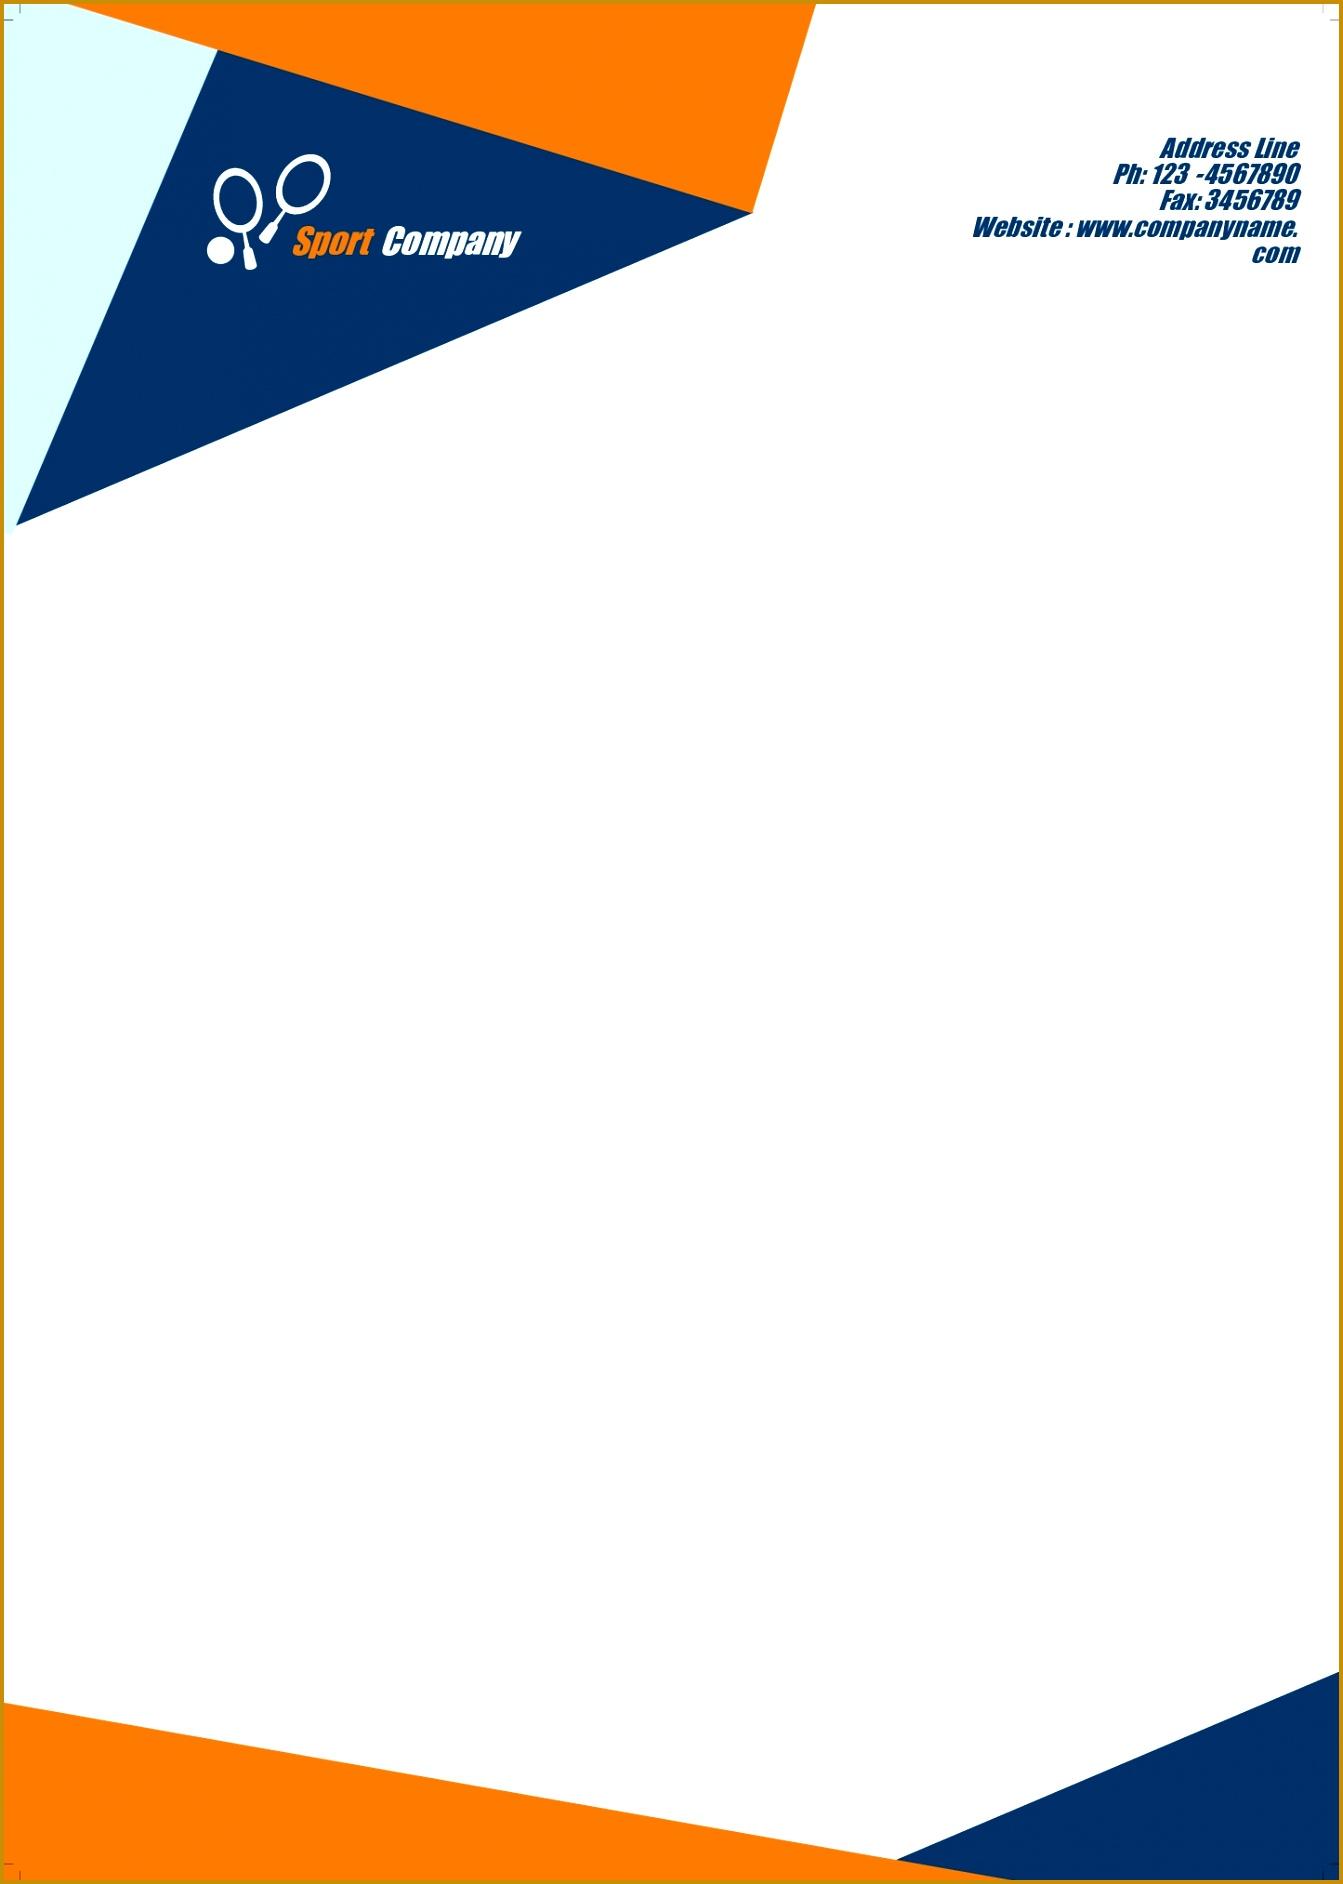 pany letterhead template free 18841343